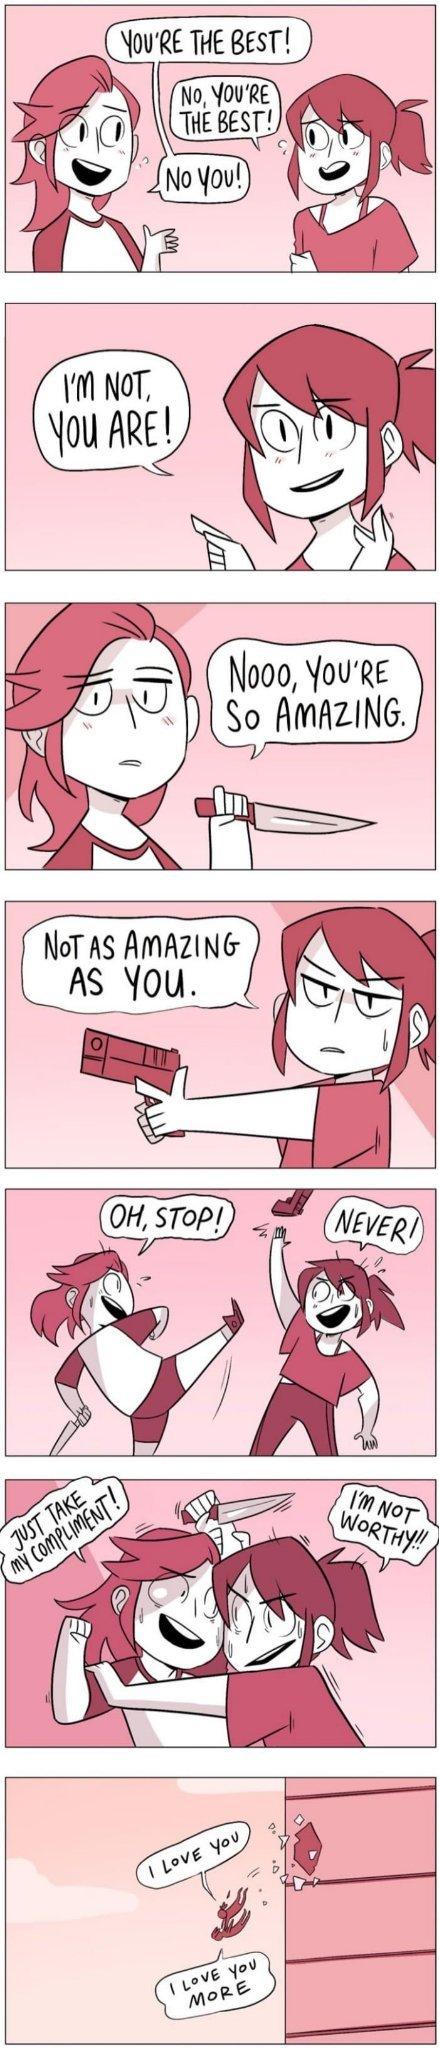 I love you, except it - meme